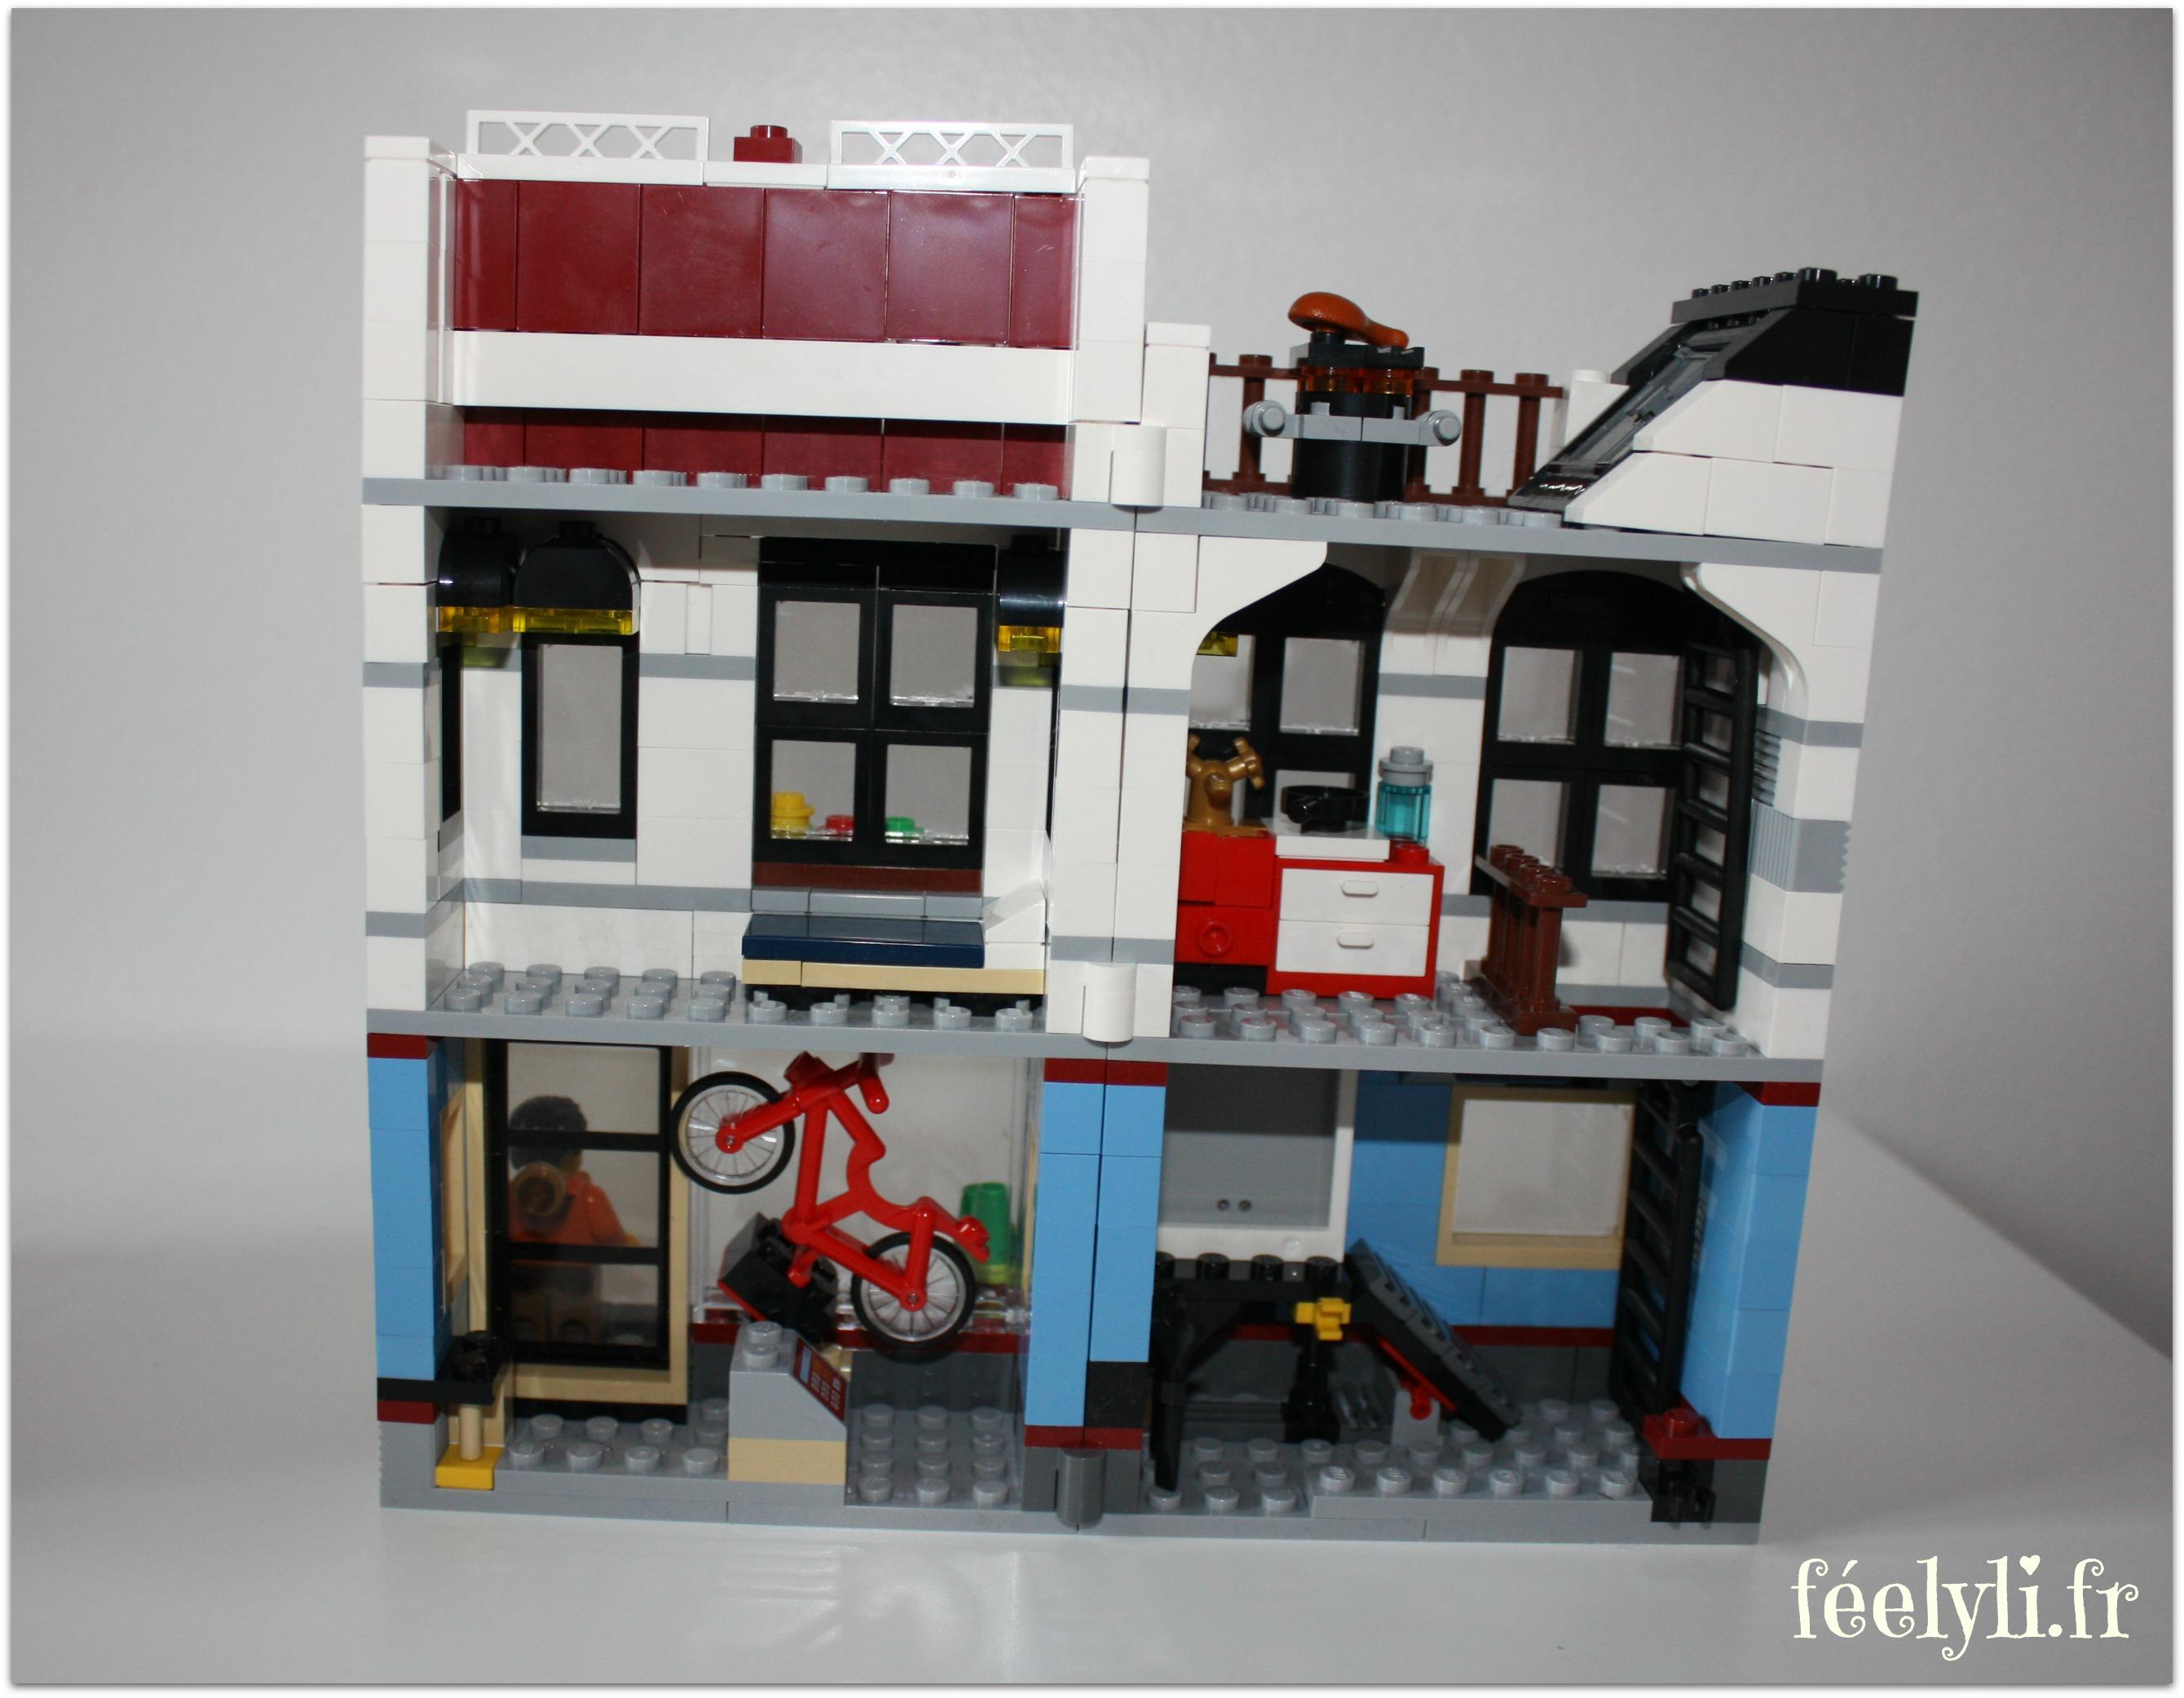 interieur magasin de velos lego